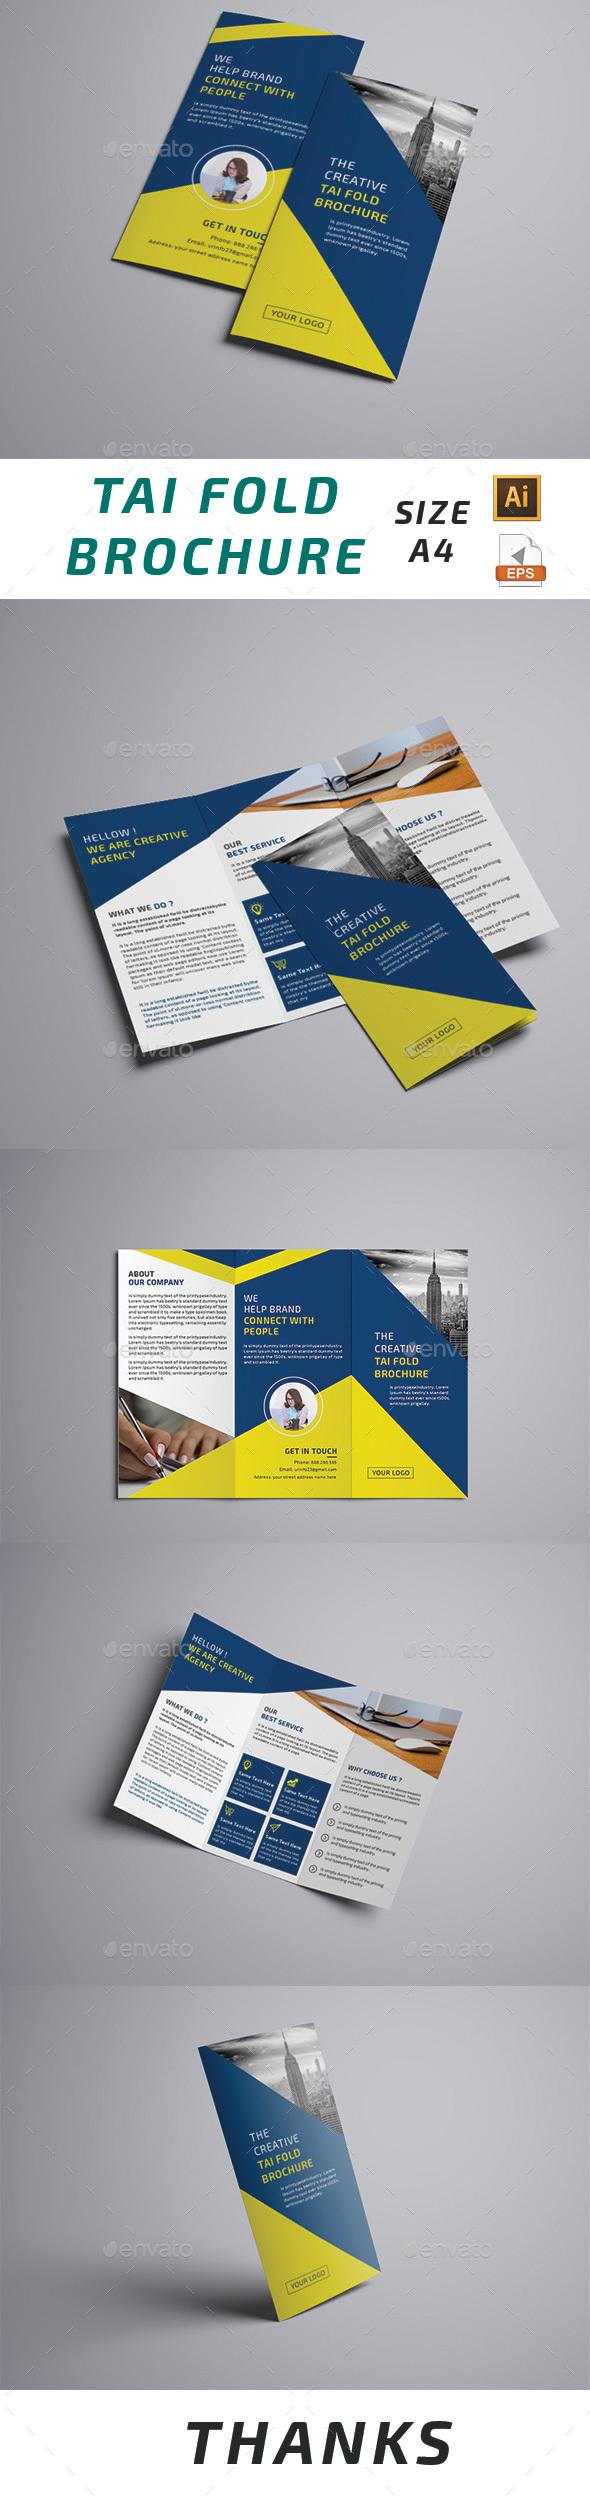 Taifold Brochure Template Vector EPS, AI Illustrator   Brochure ...